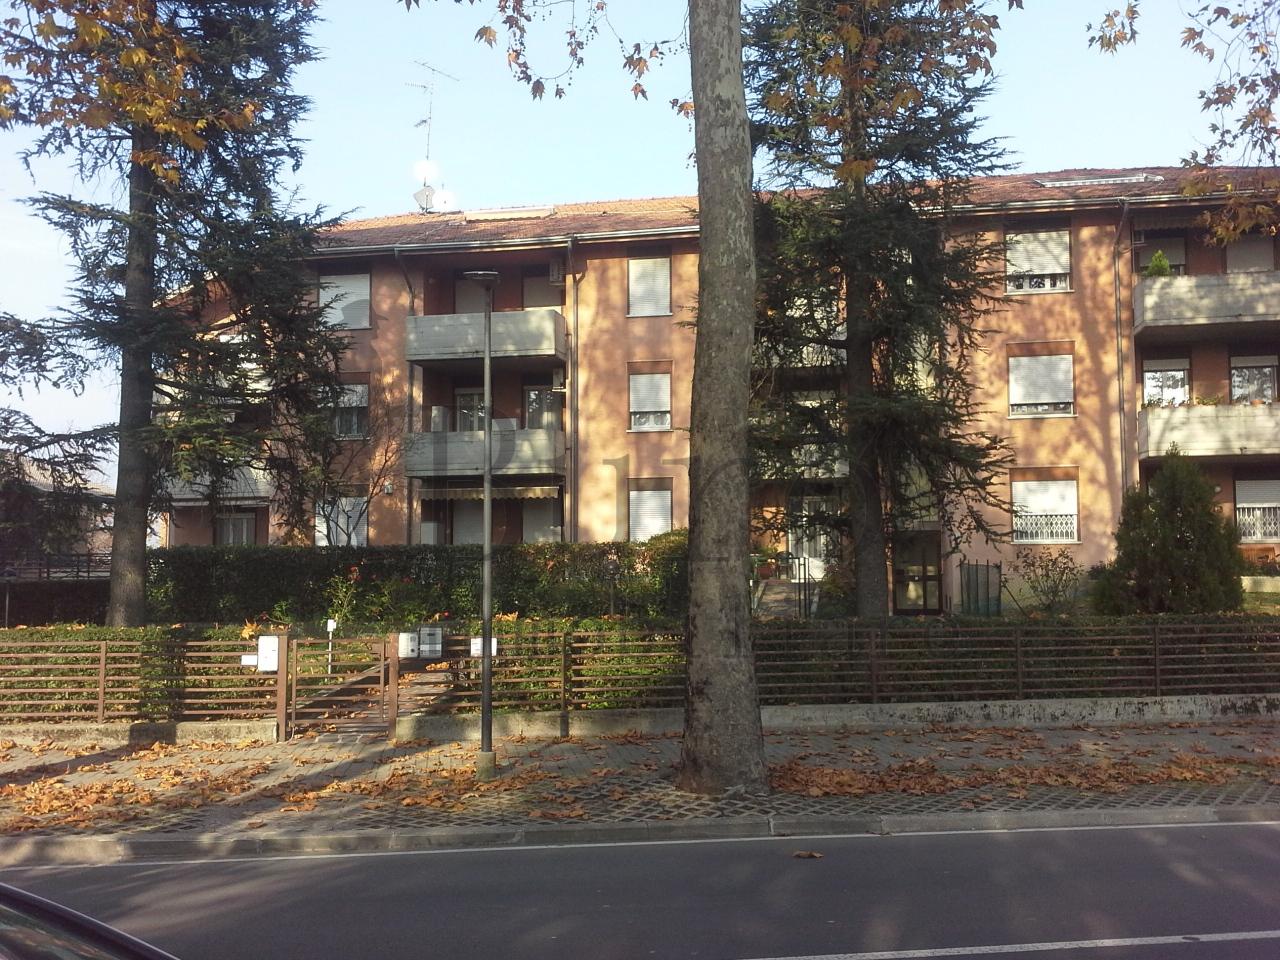 Appartamento - 2 camere a Parma Città Sud, Parma